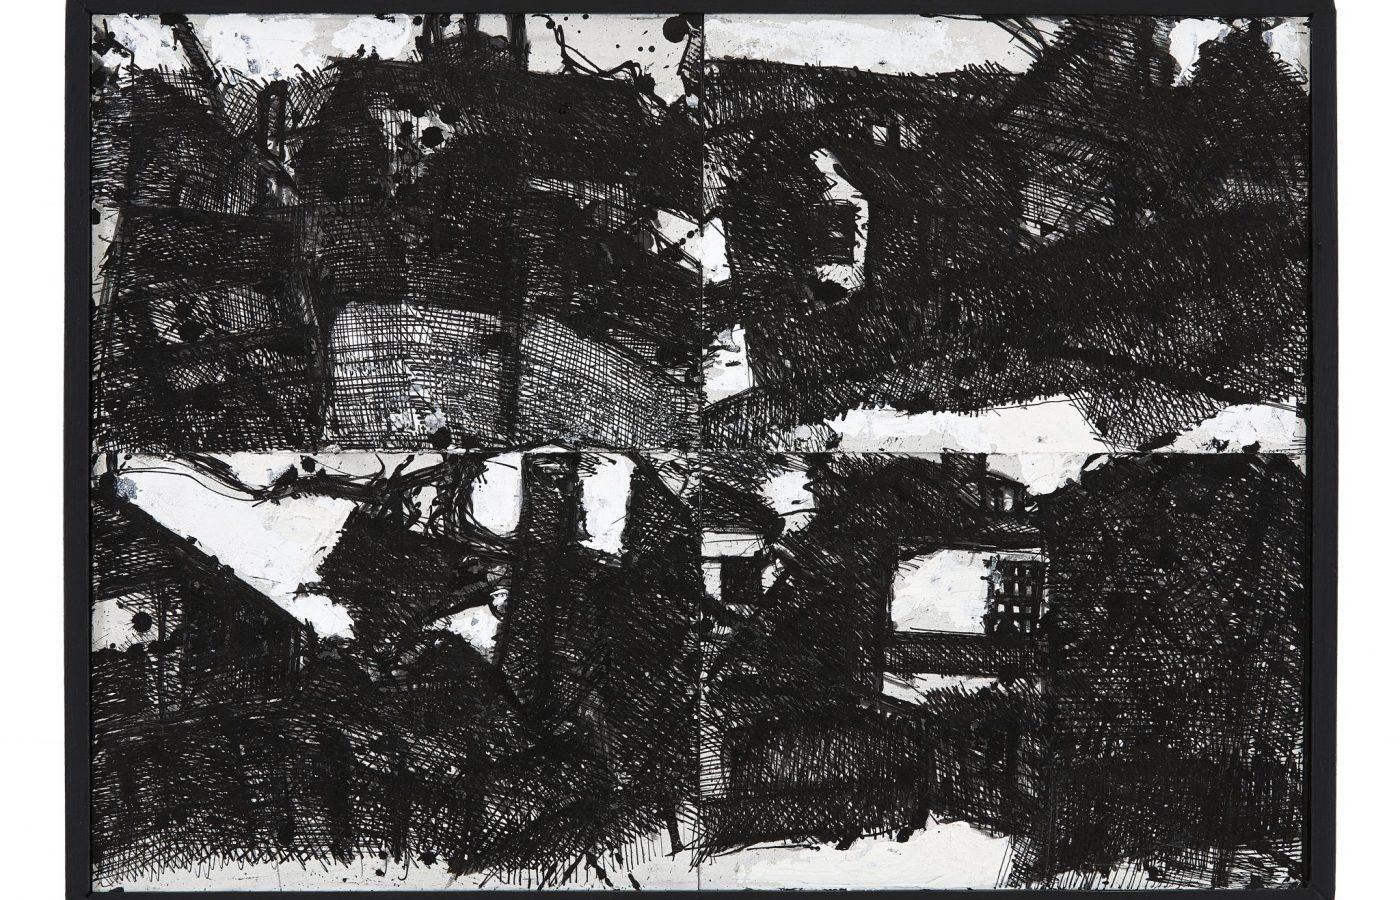 FXF18-11 John Virtue Landscape No 122 1990-91